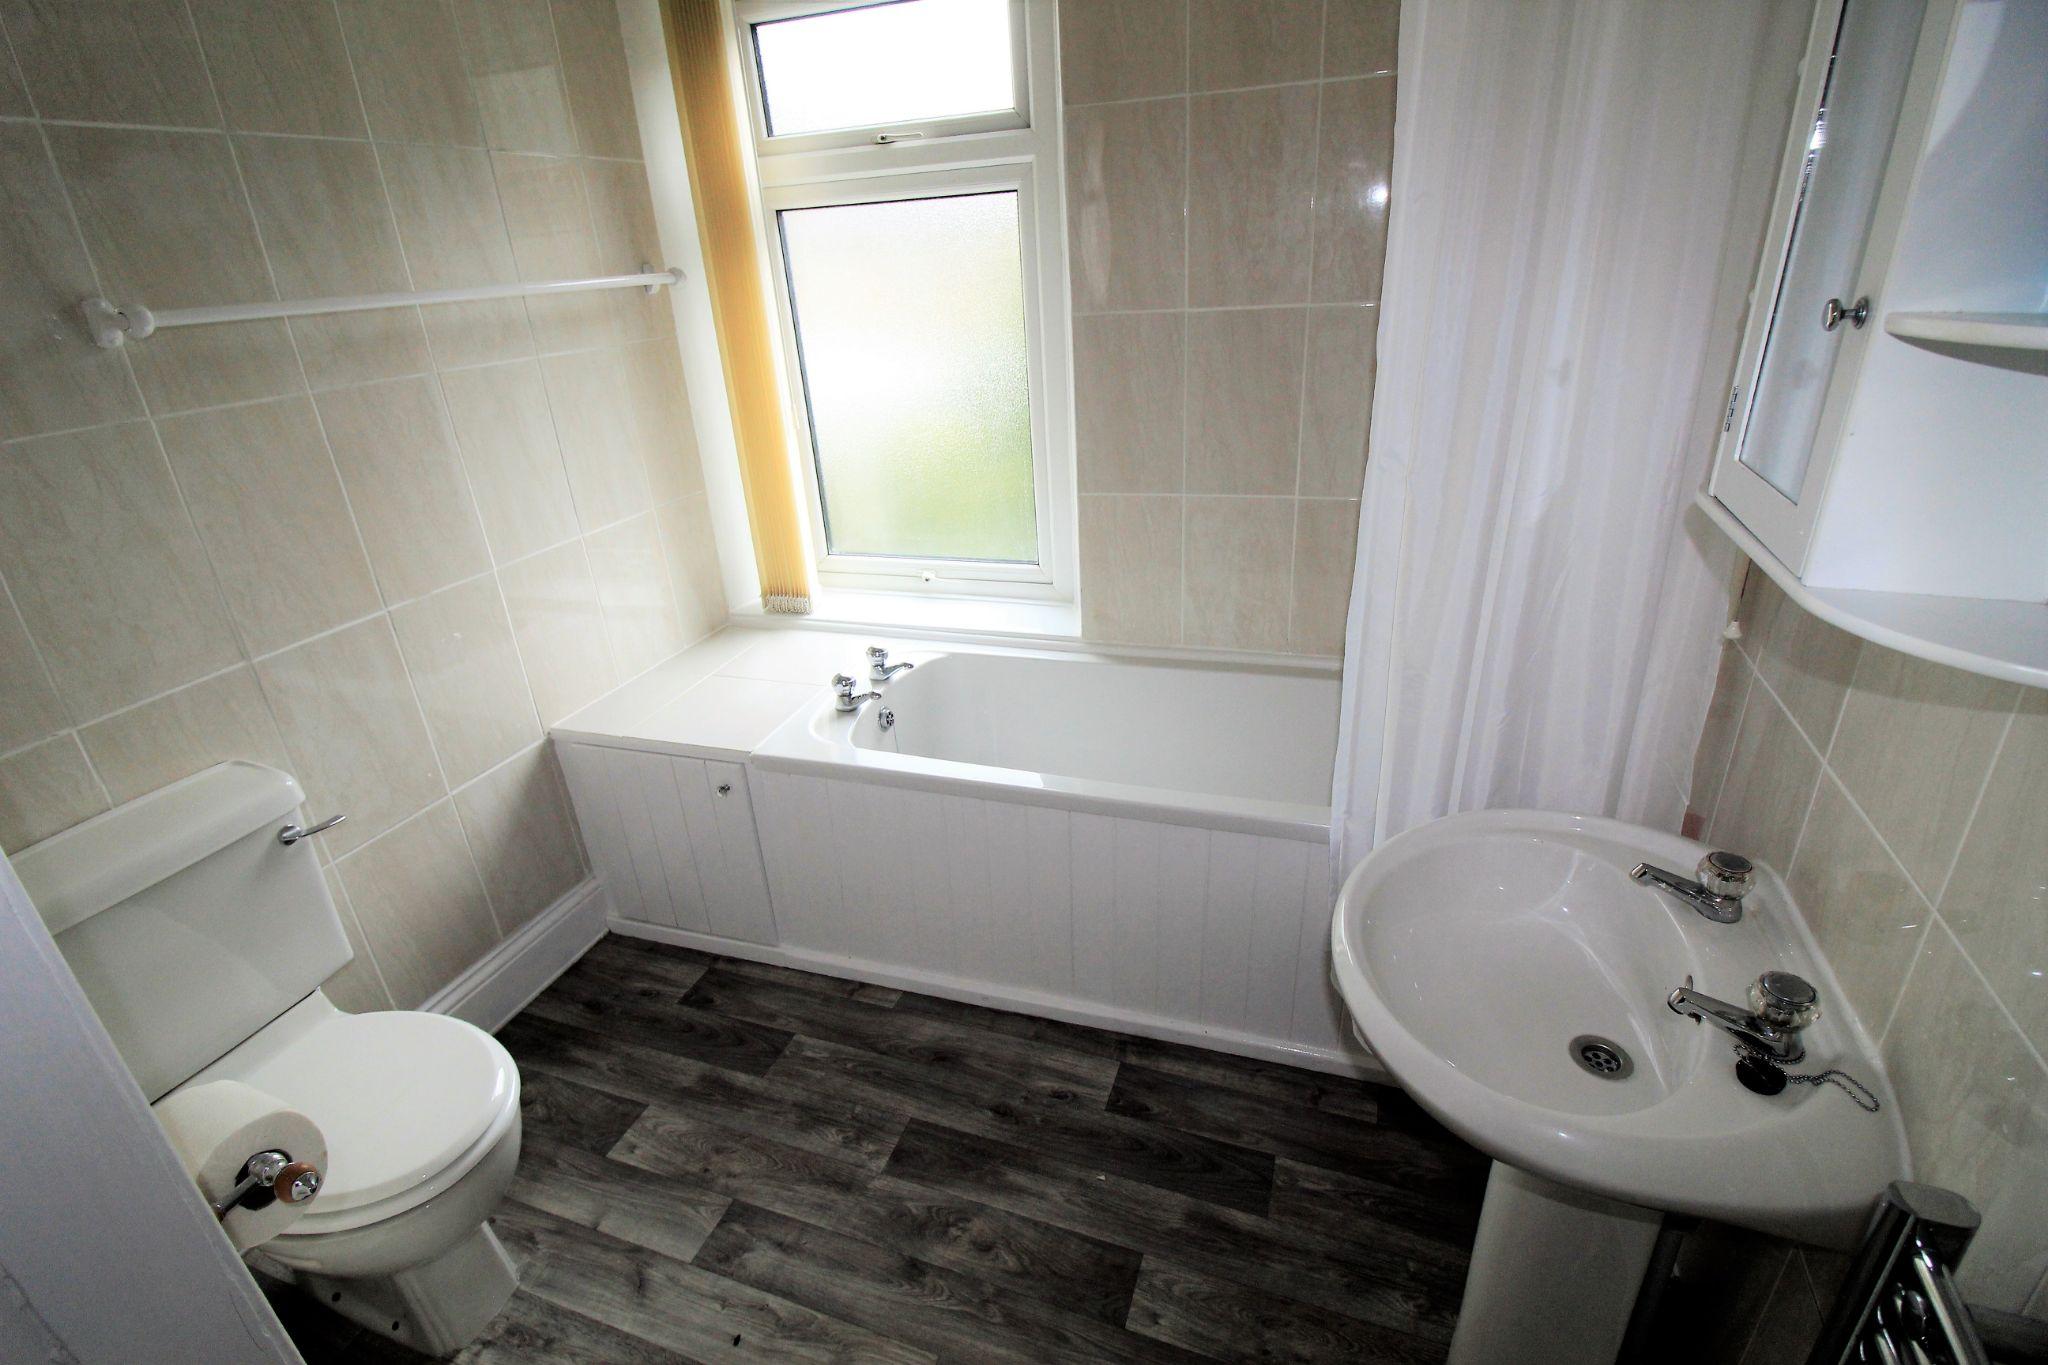 2 bedroom semi-detached house SSTC in Huddersfield - Bathroom